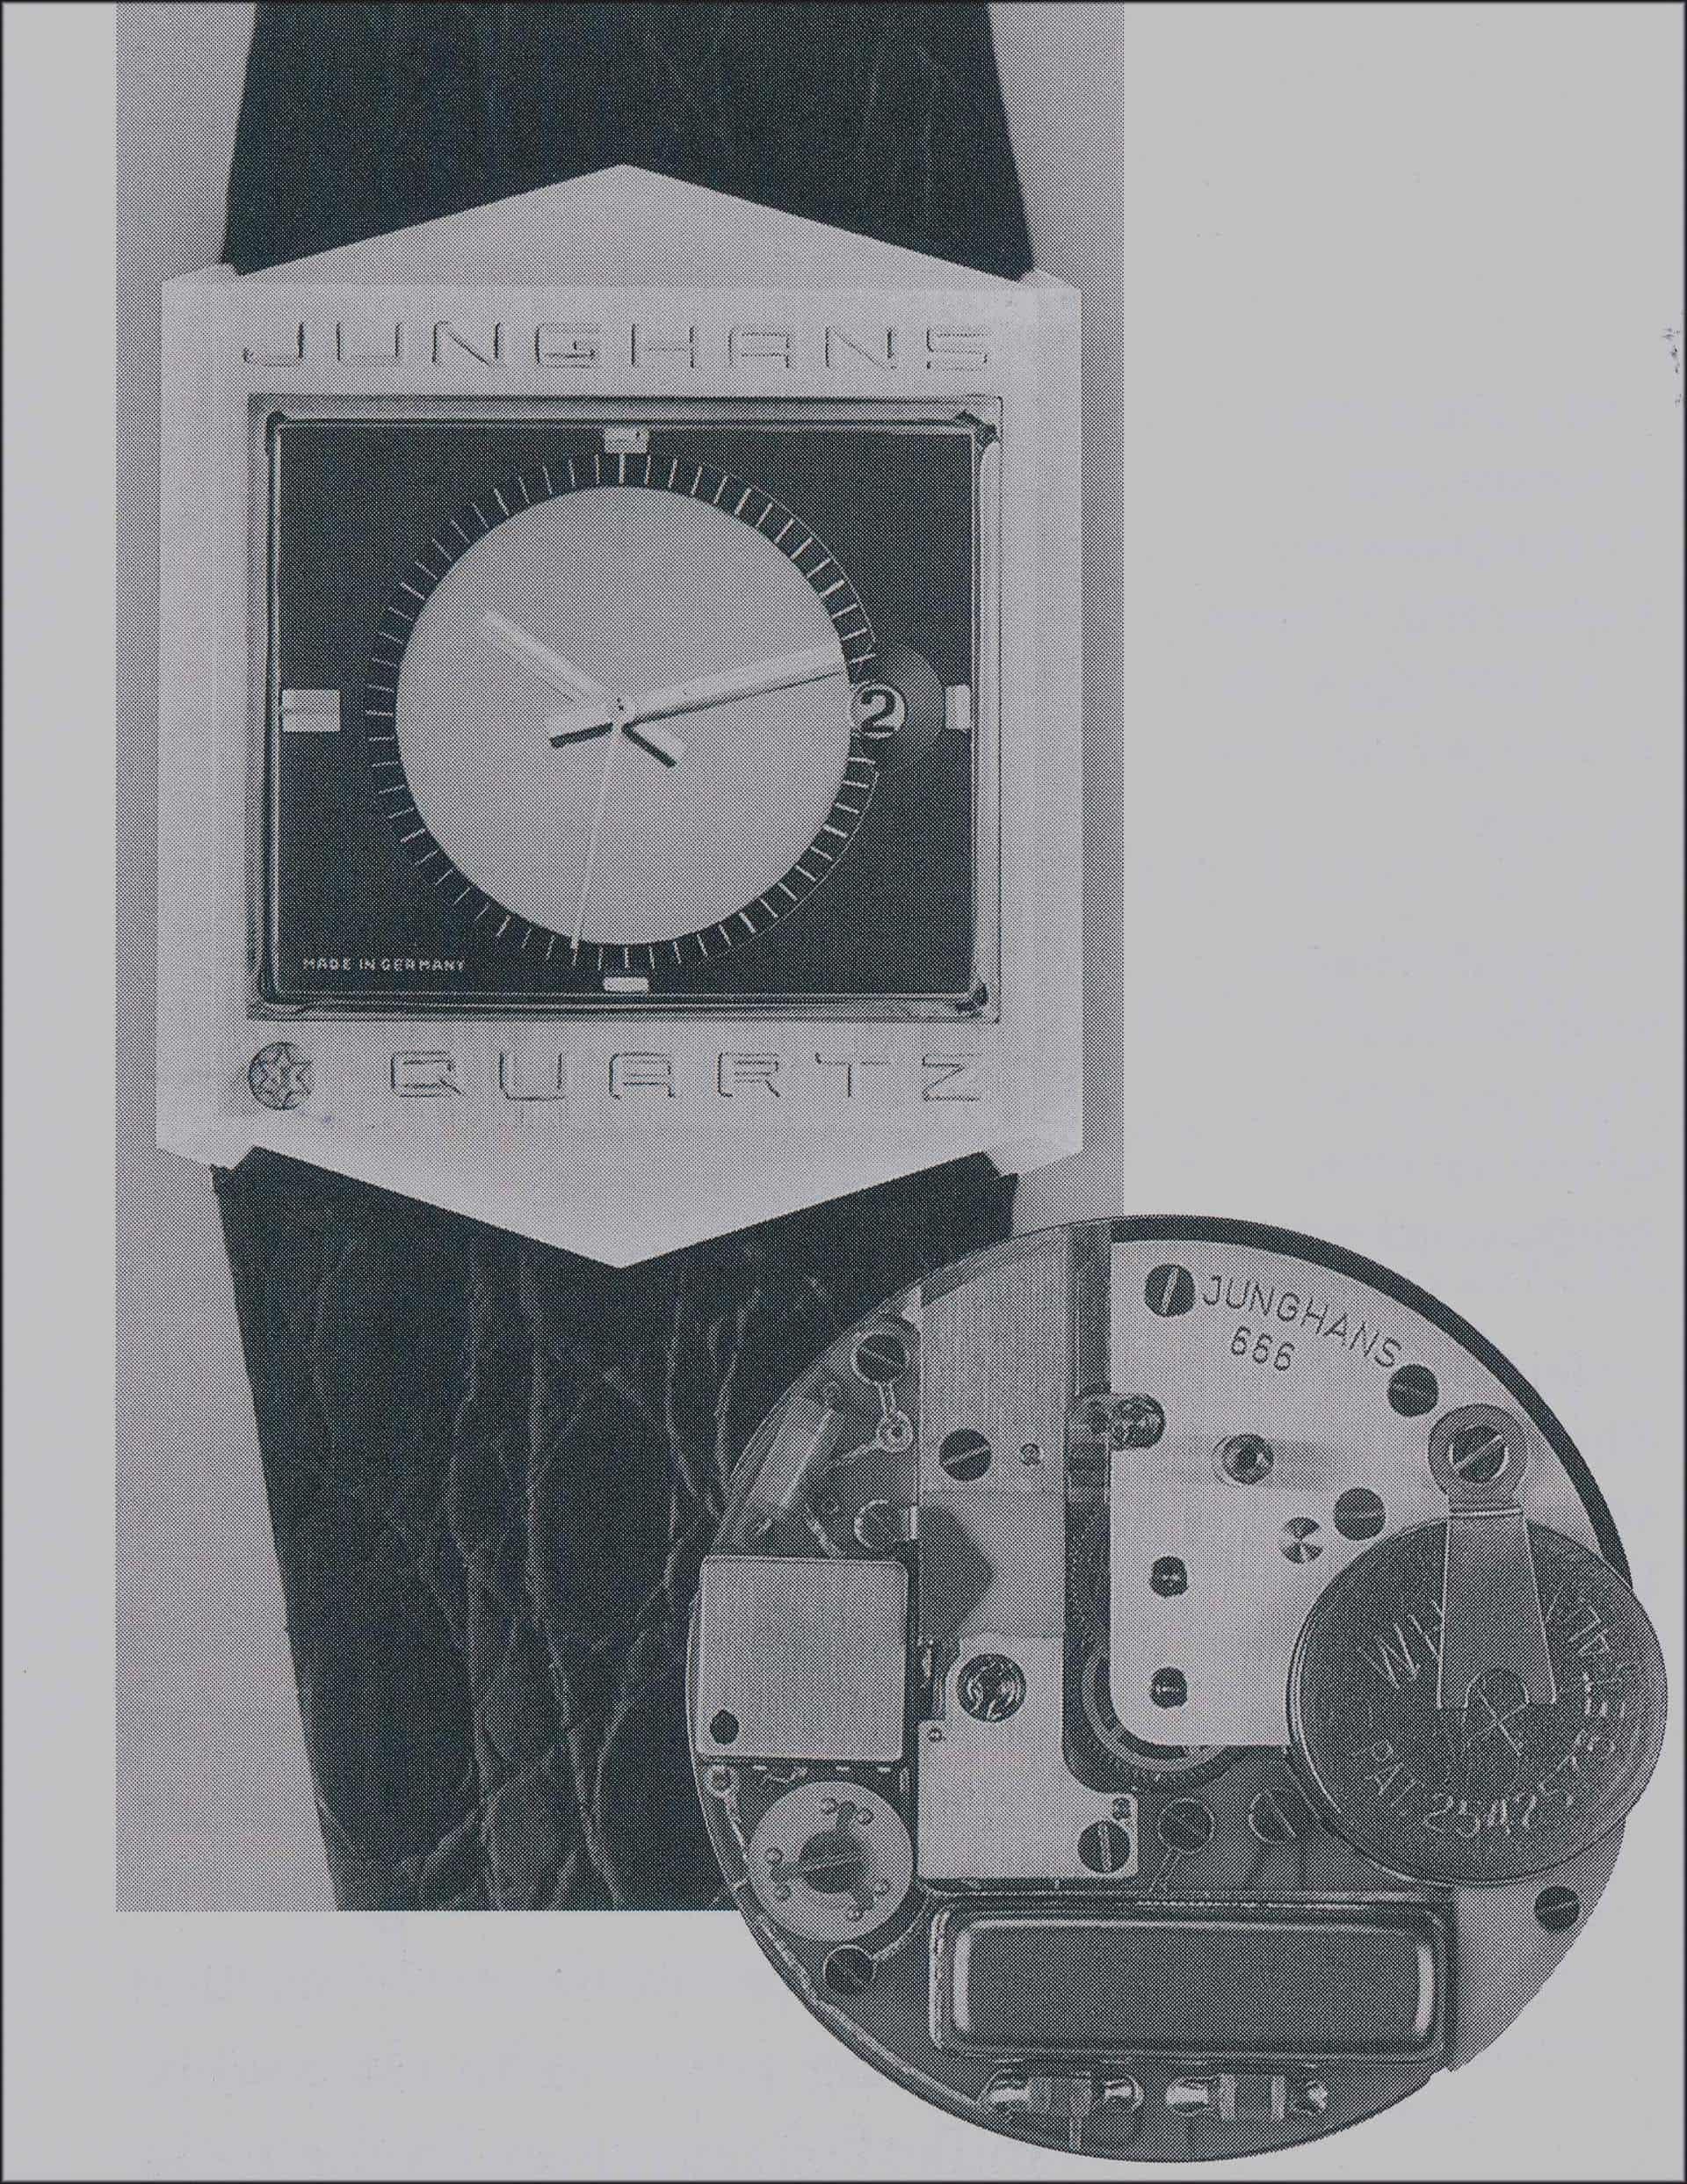 Junghans Astro-Quartz mit dem digitalen Kaliber 666 aus dem Jahr 1970